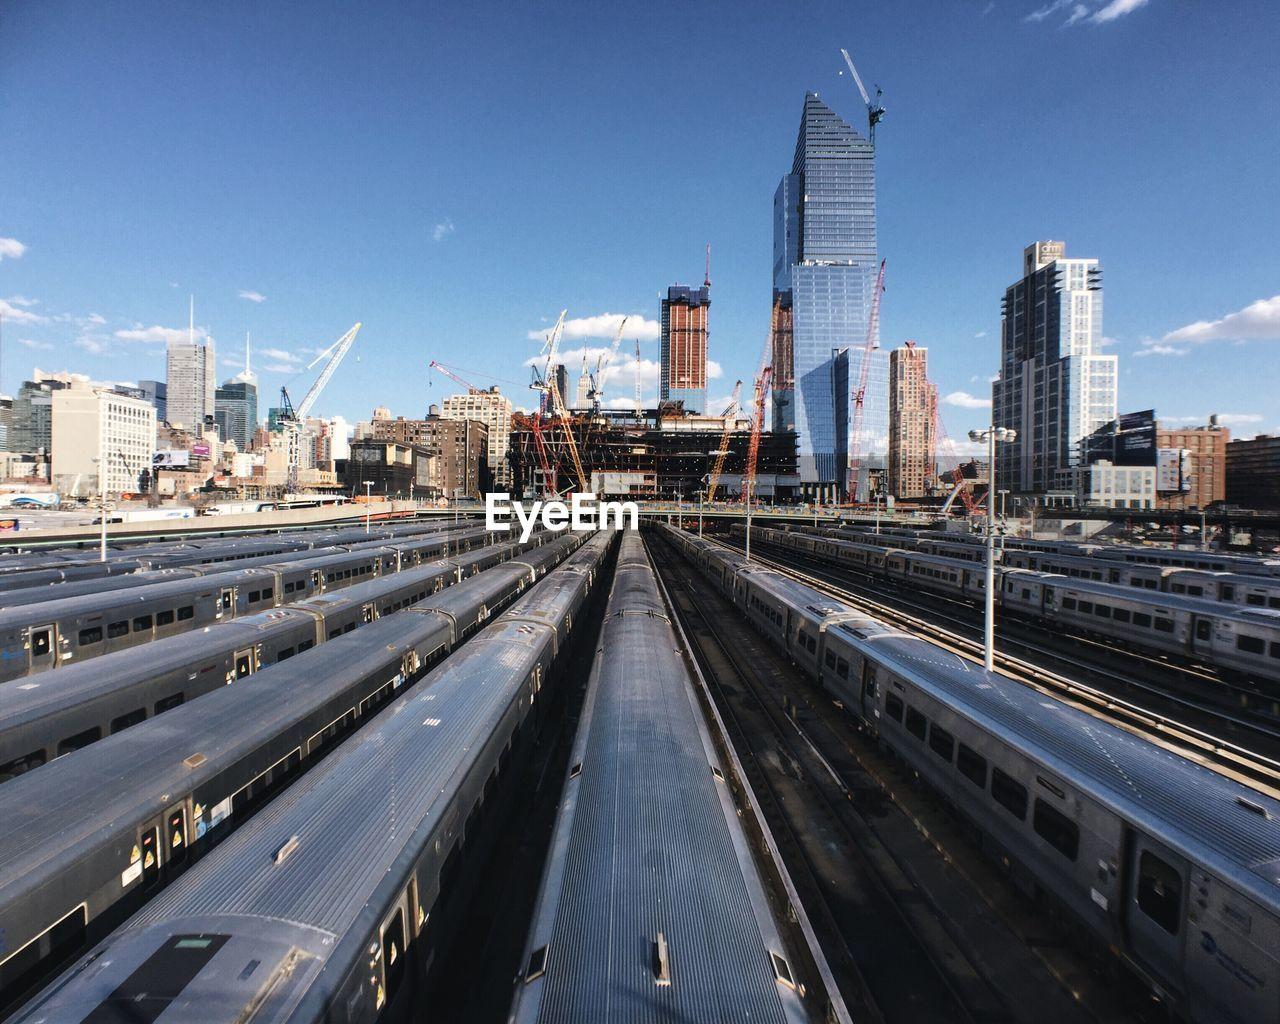 Trains at shunting yard in city